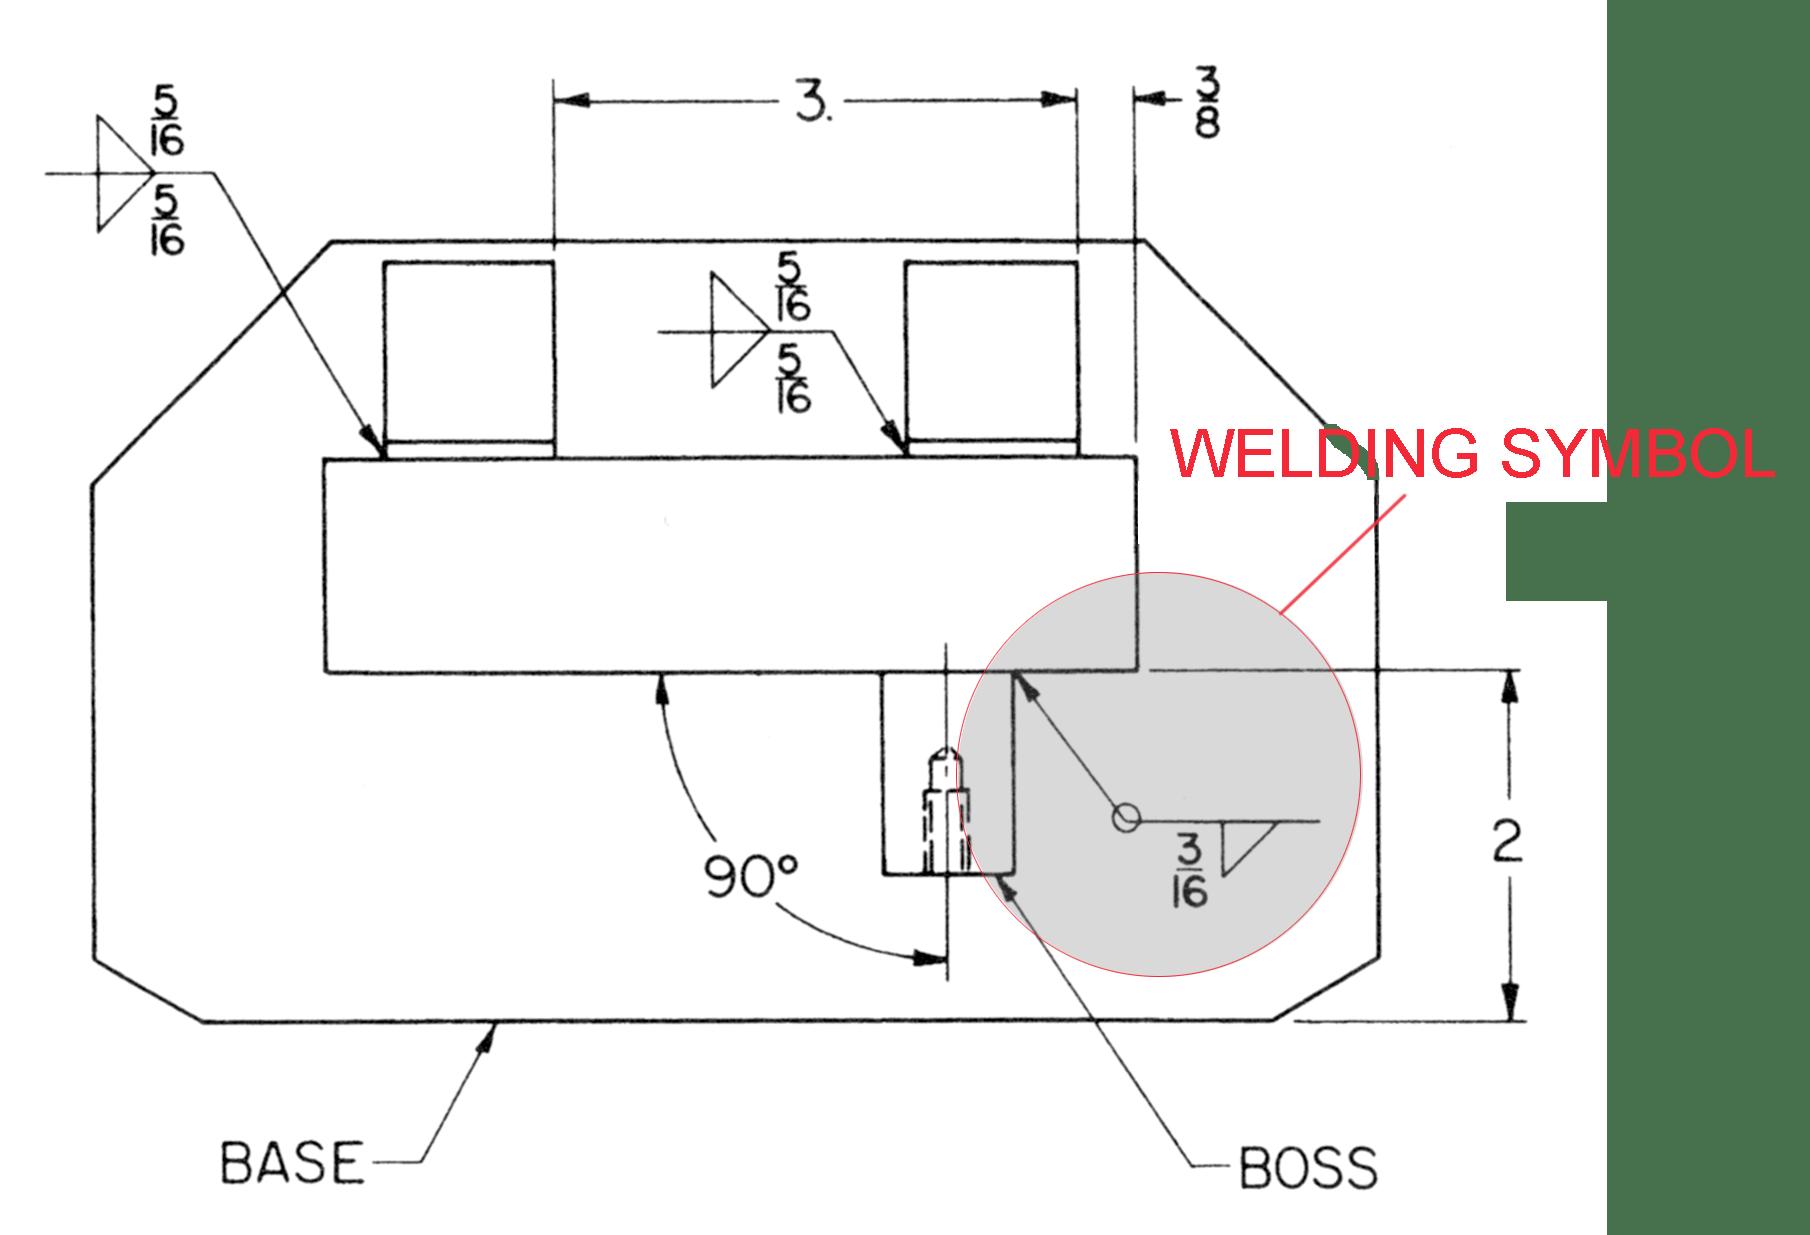 hight resolution of welding symbol